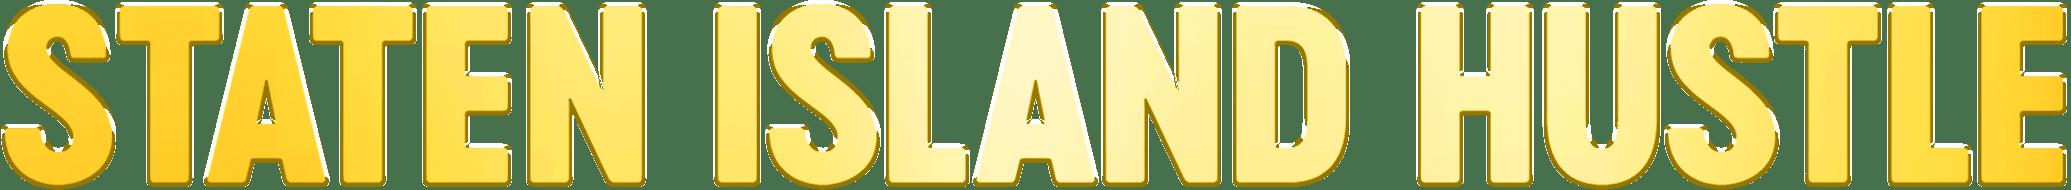 staten-island-hustle-logo